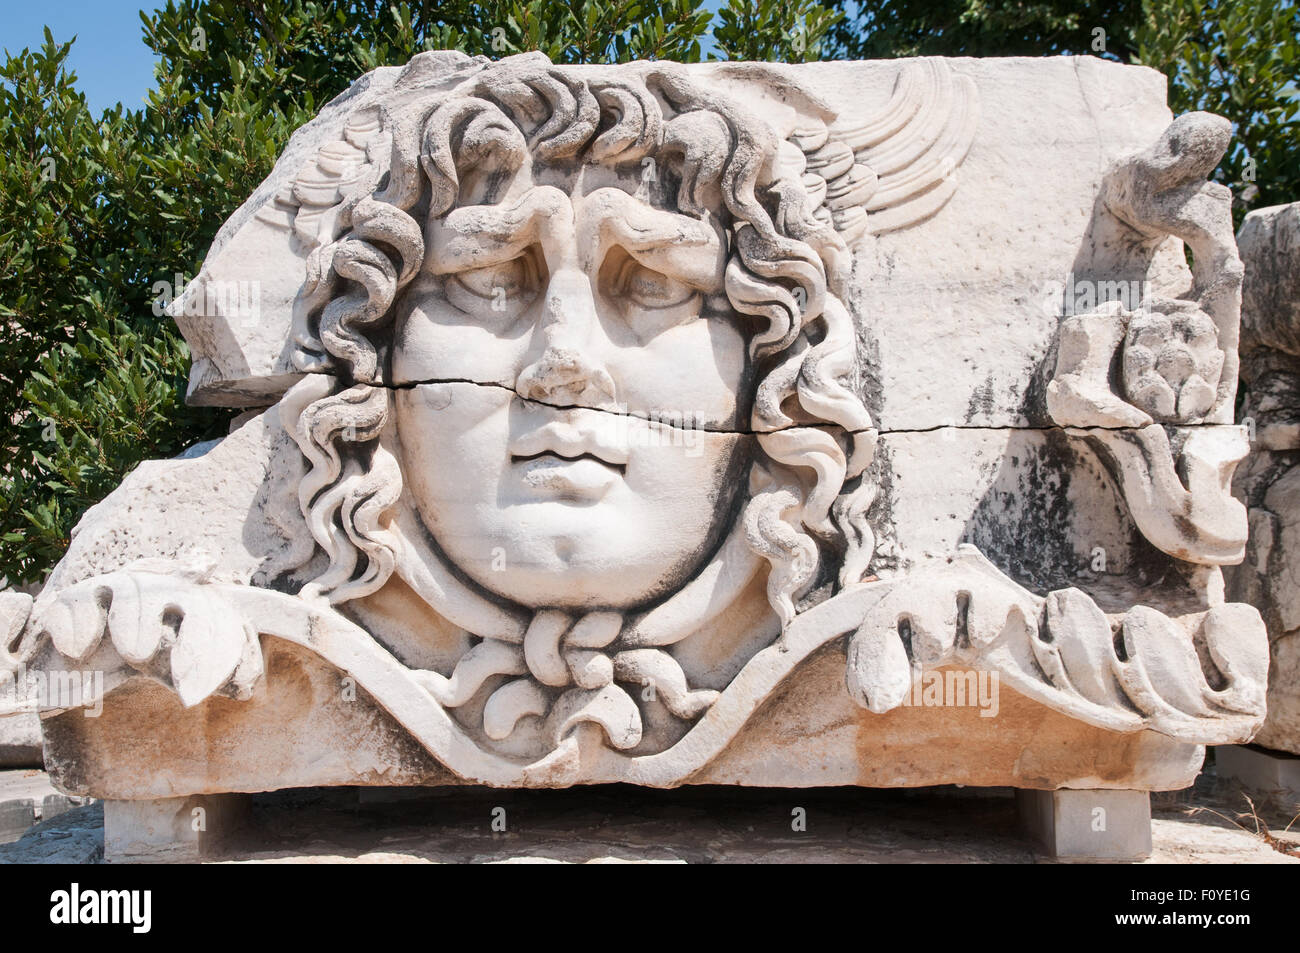 Medusa Gorgon in Apollo Temple, Didyma - Stock Image